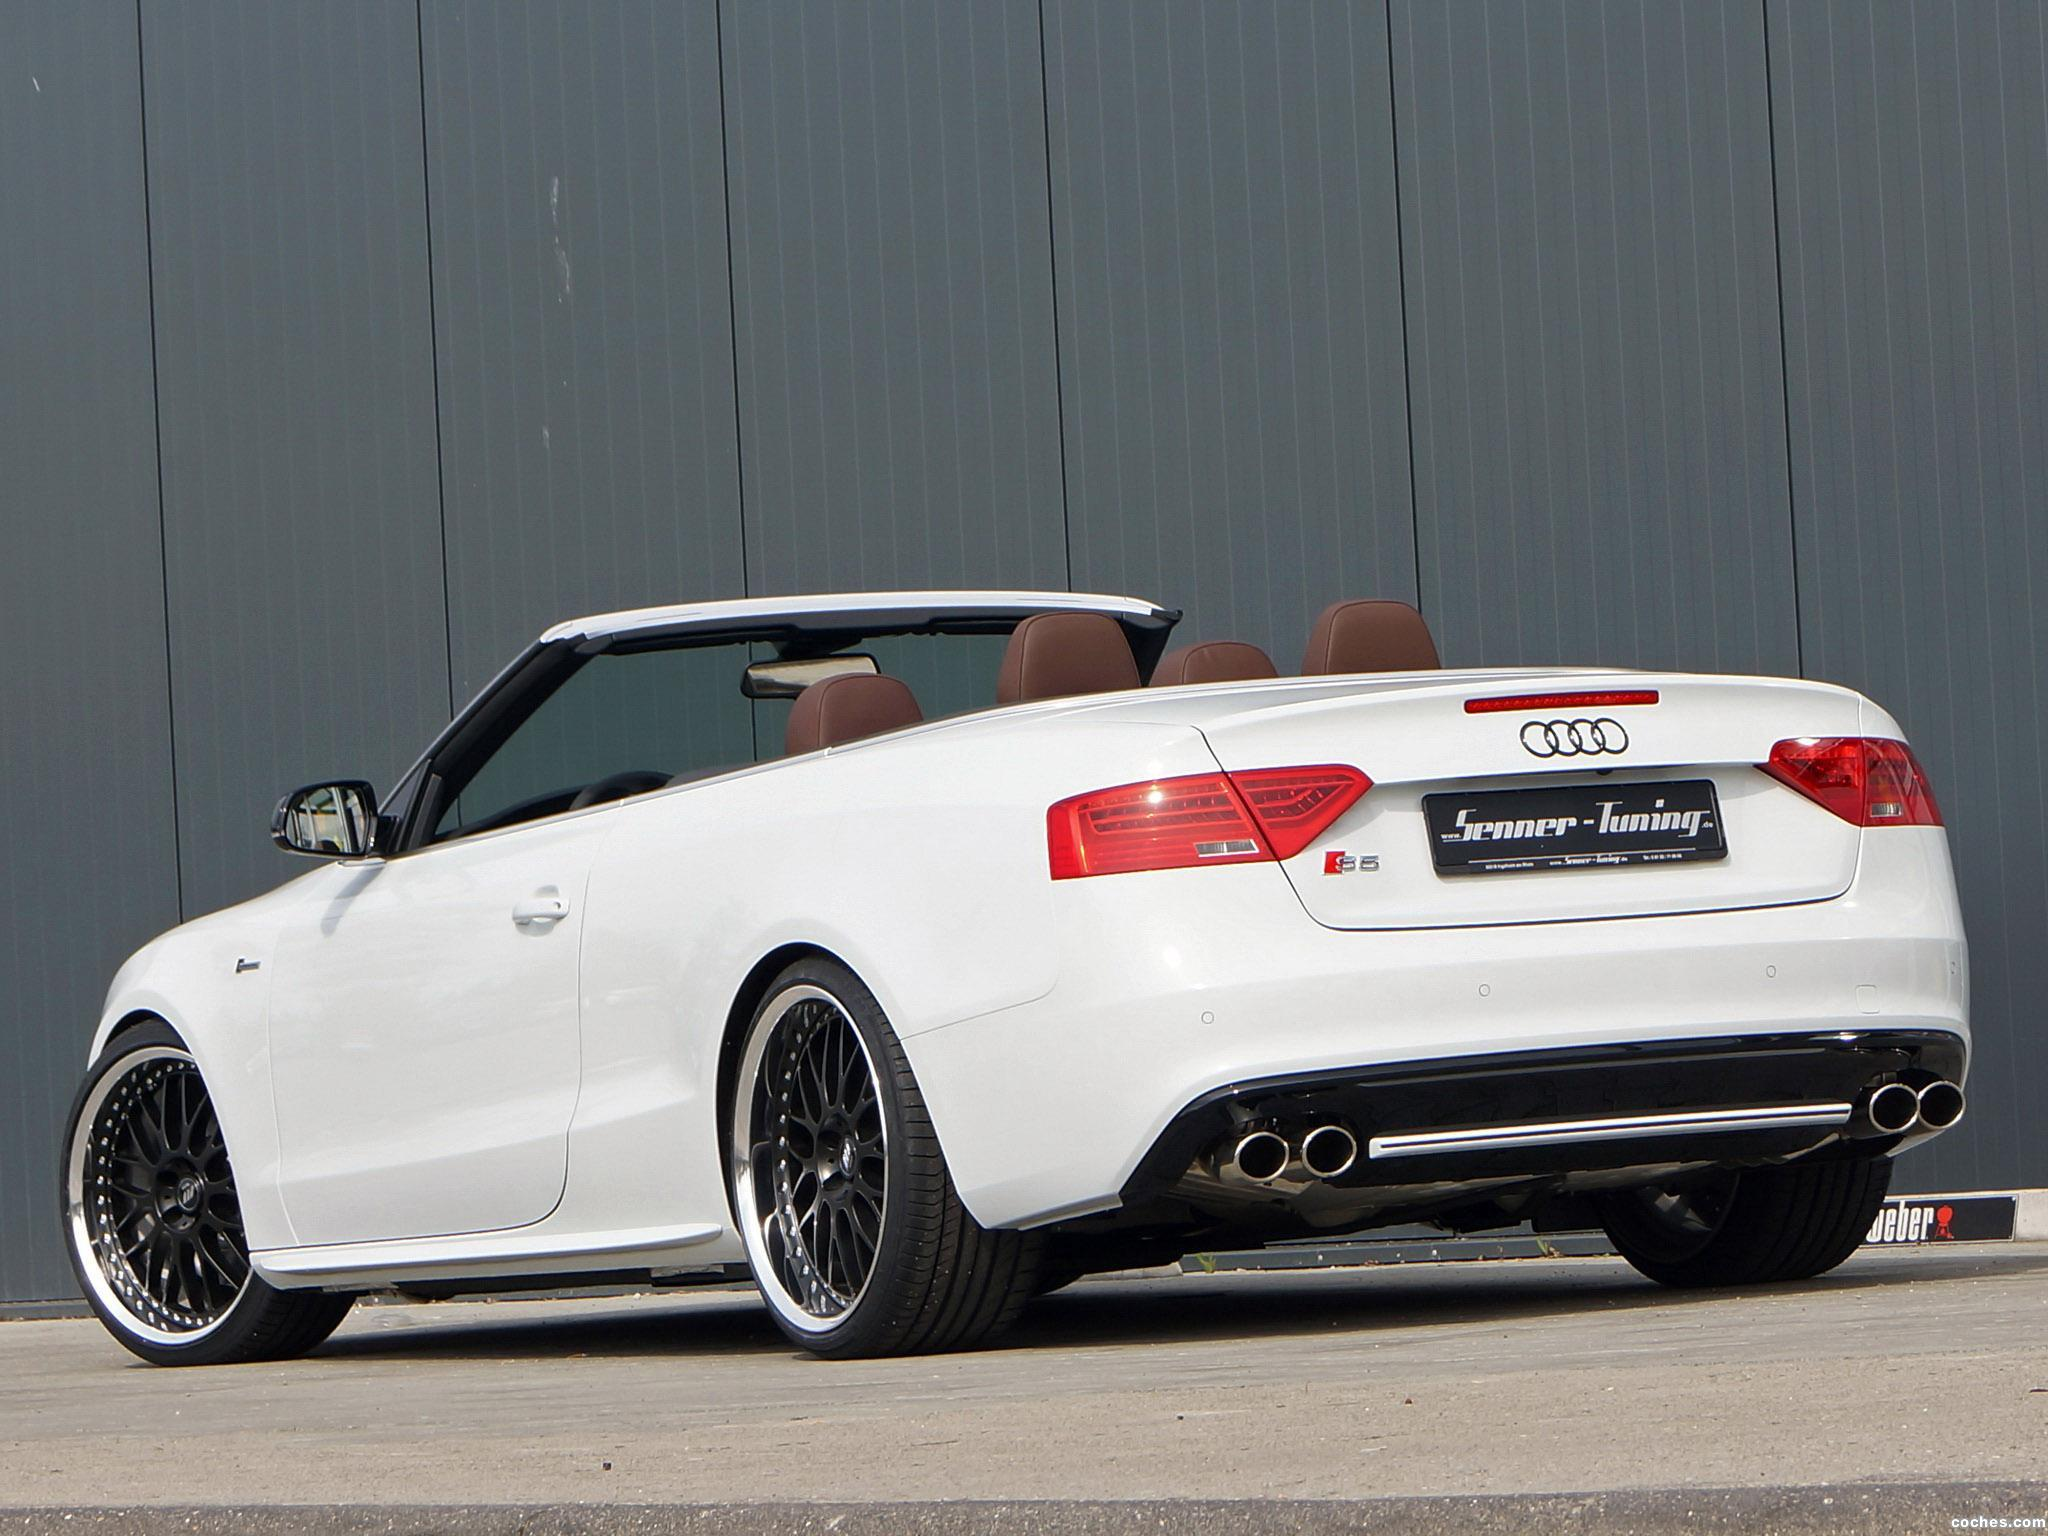 Foto 2 de Audi Senner S5 Cabriolet 2013